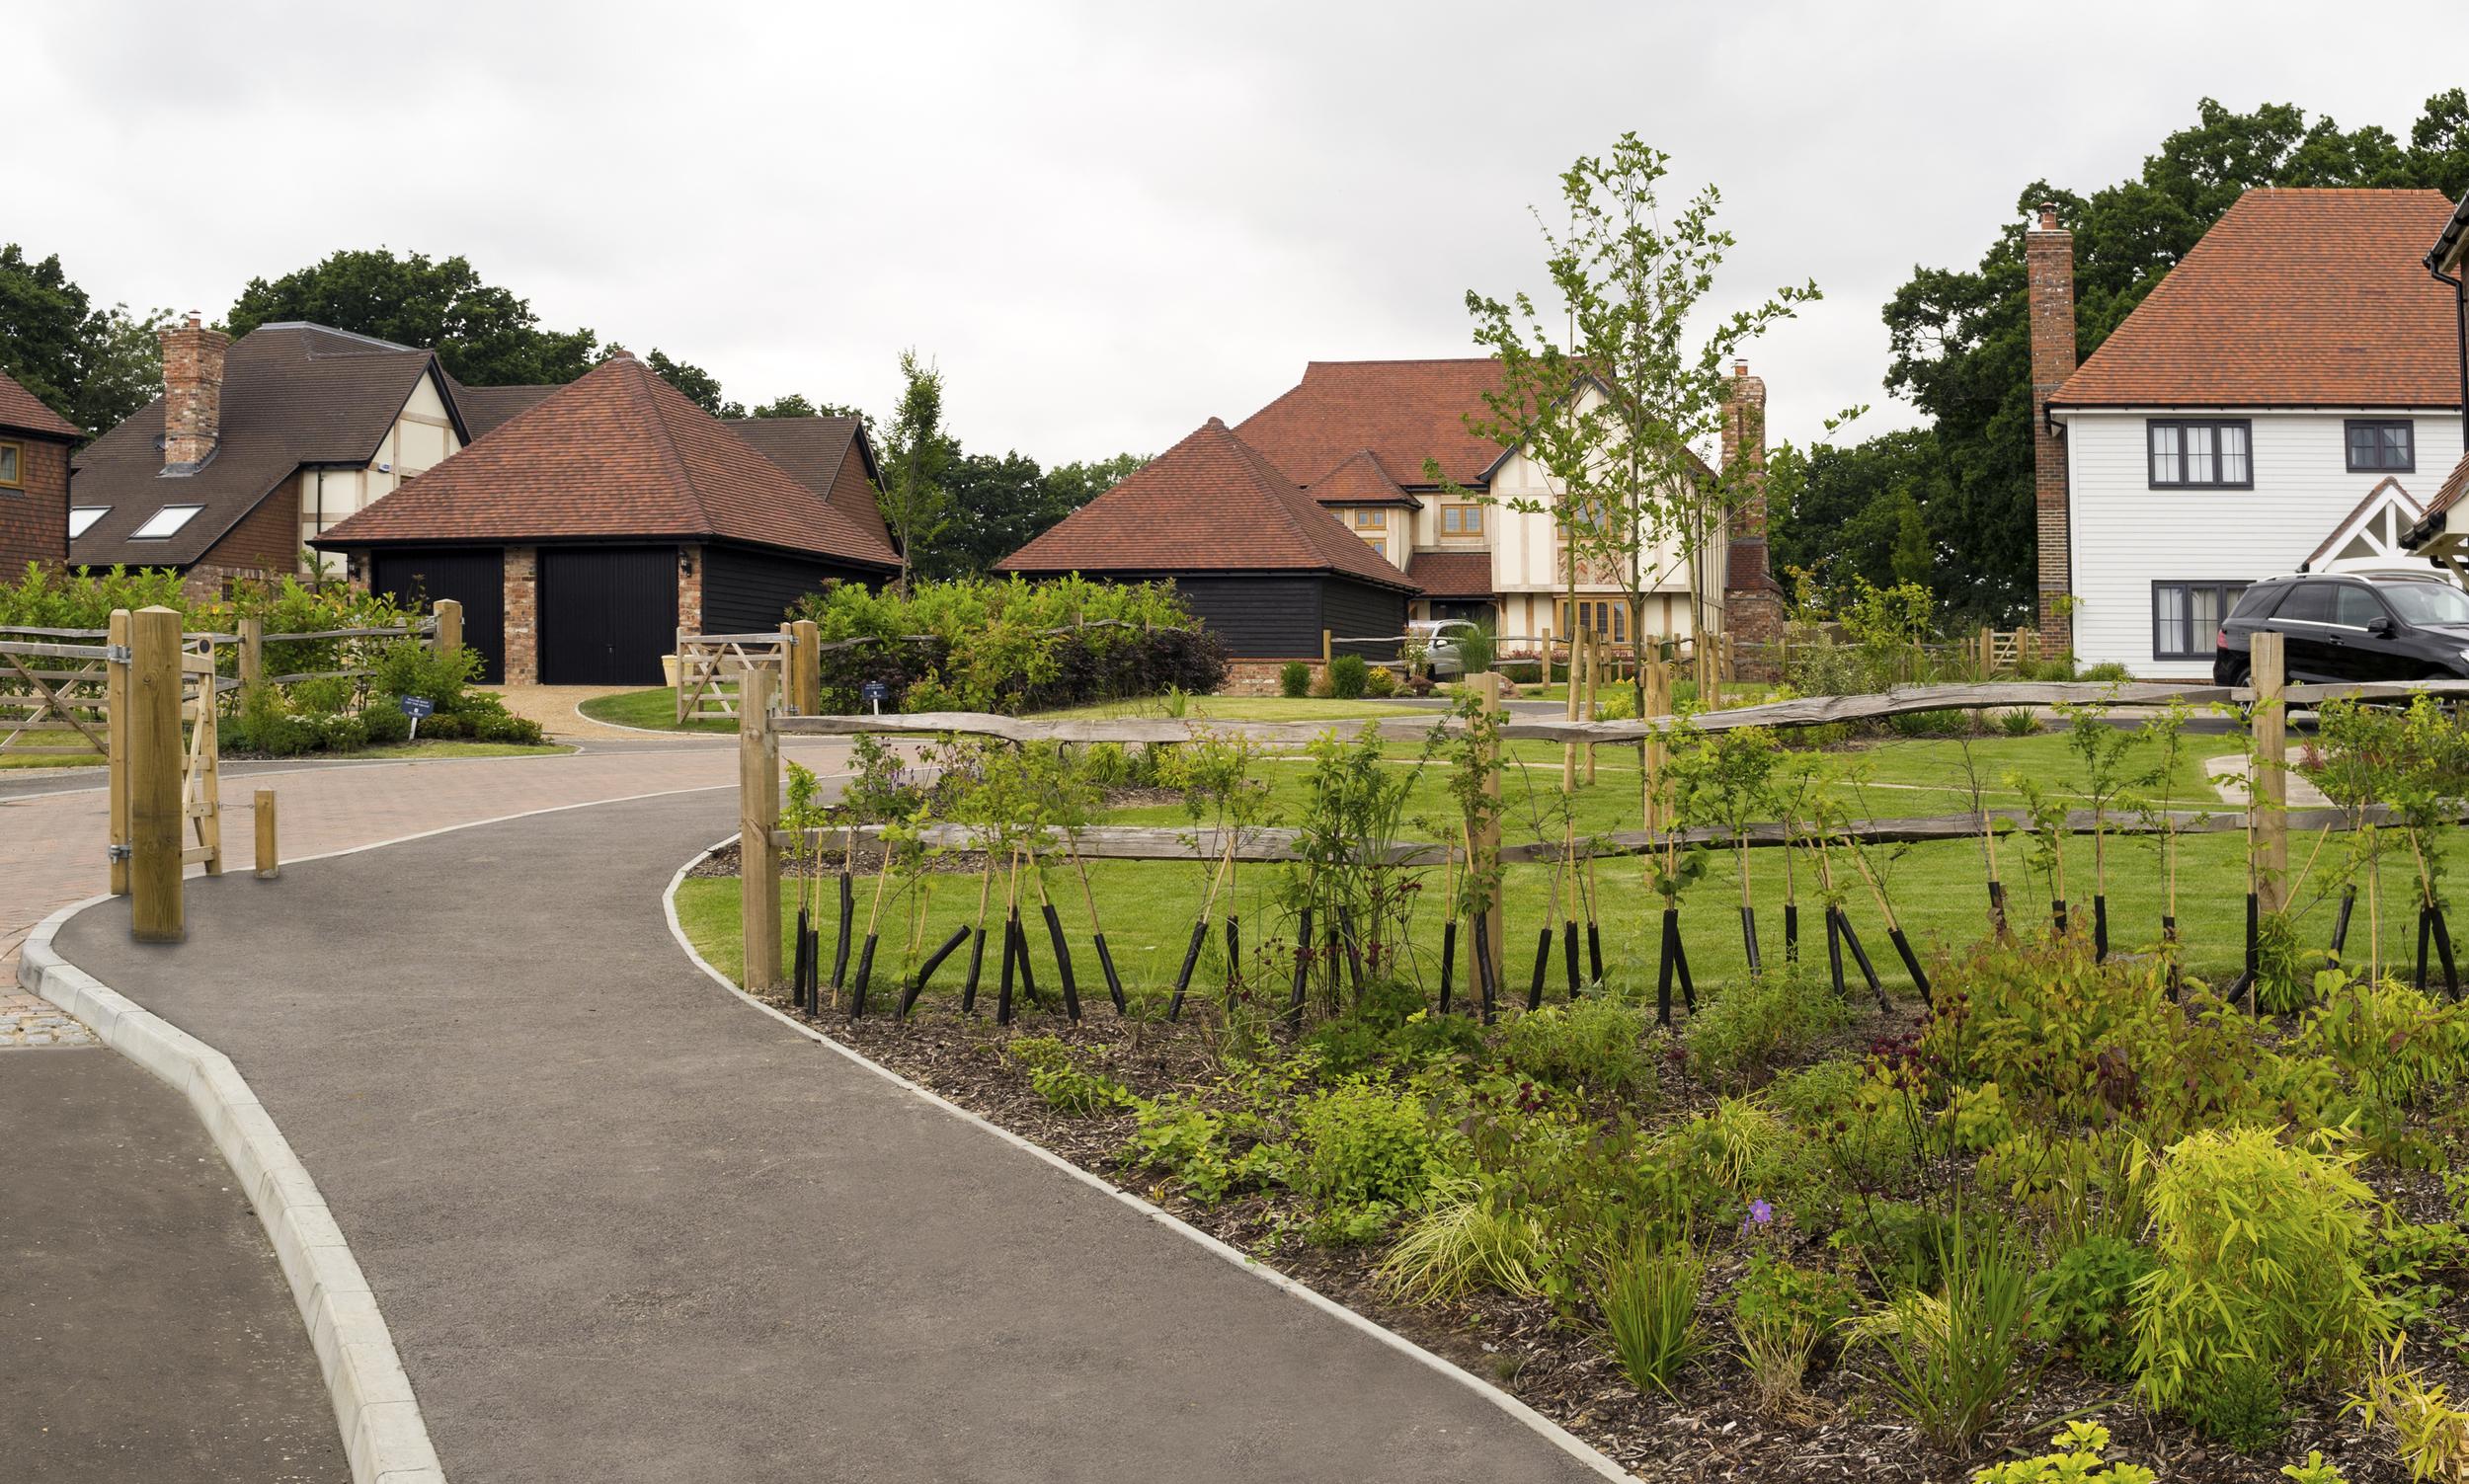 Etchingham Barns, Etchingham